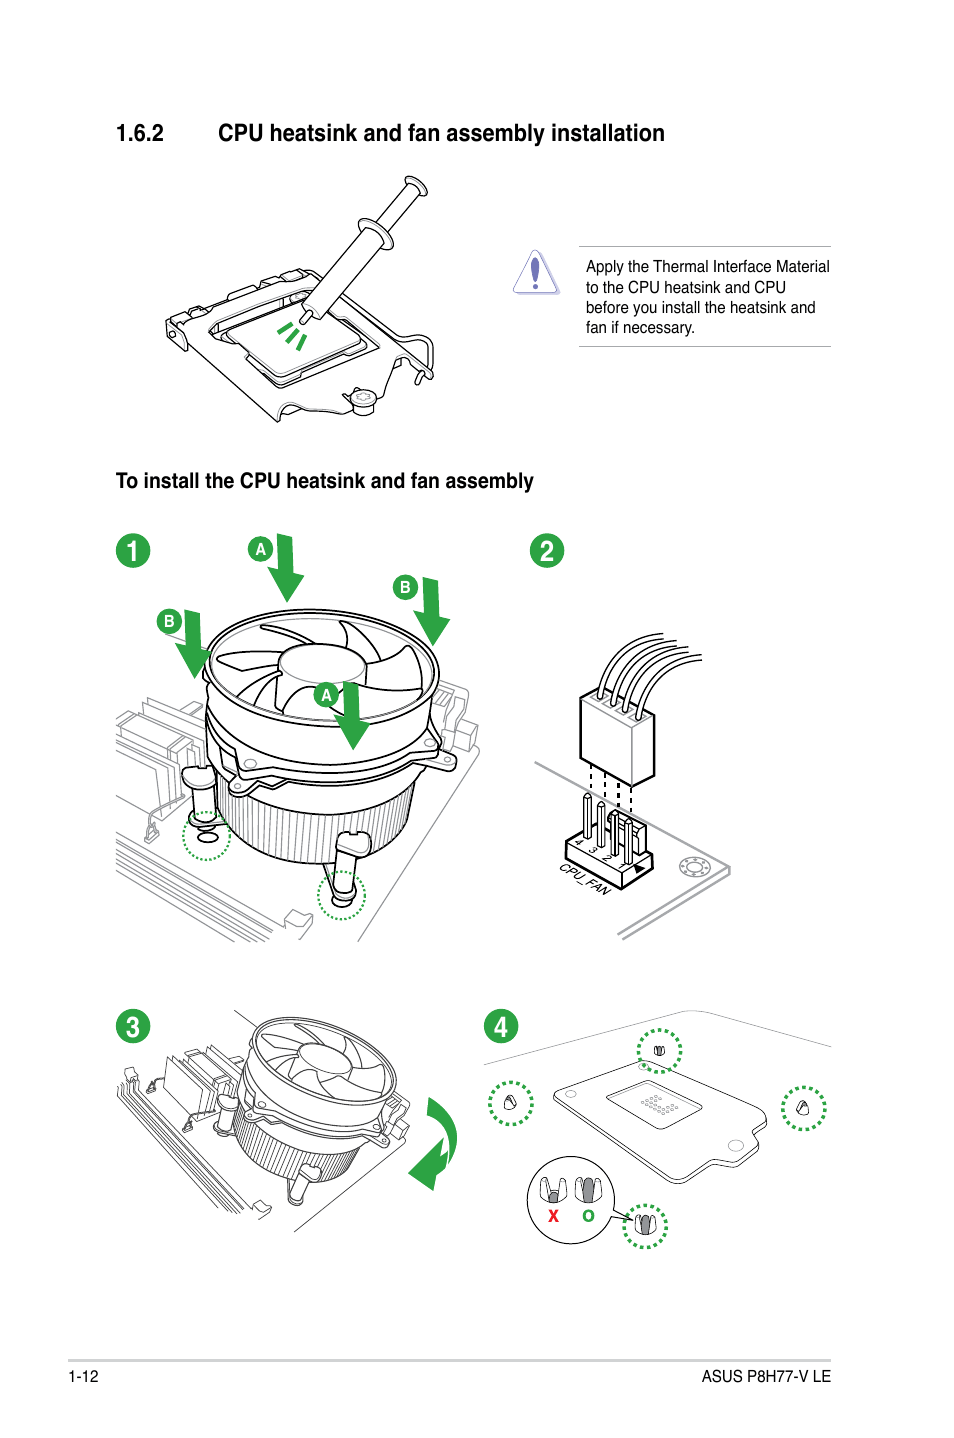 2 cpu heatsink and fan assembly installation, Cpu heatsink